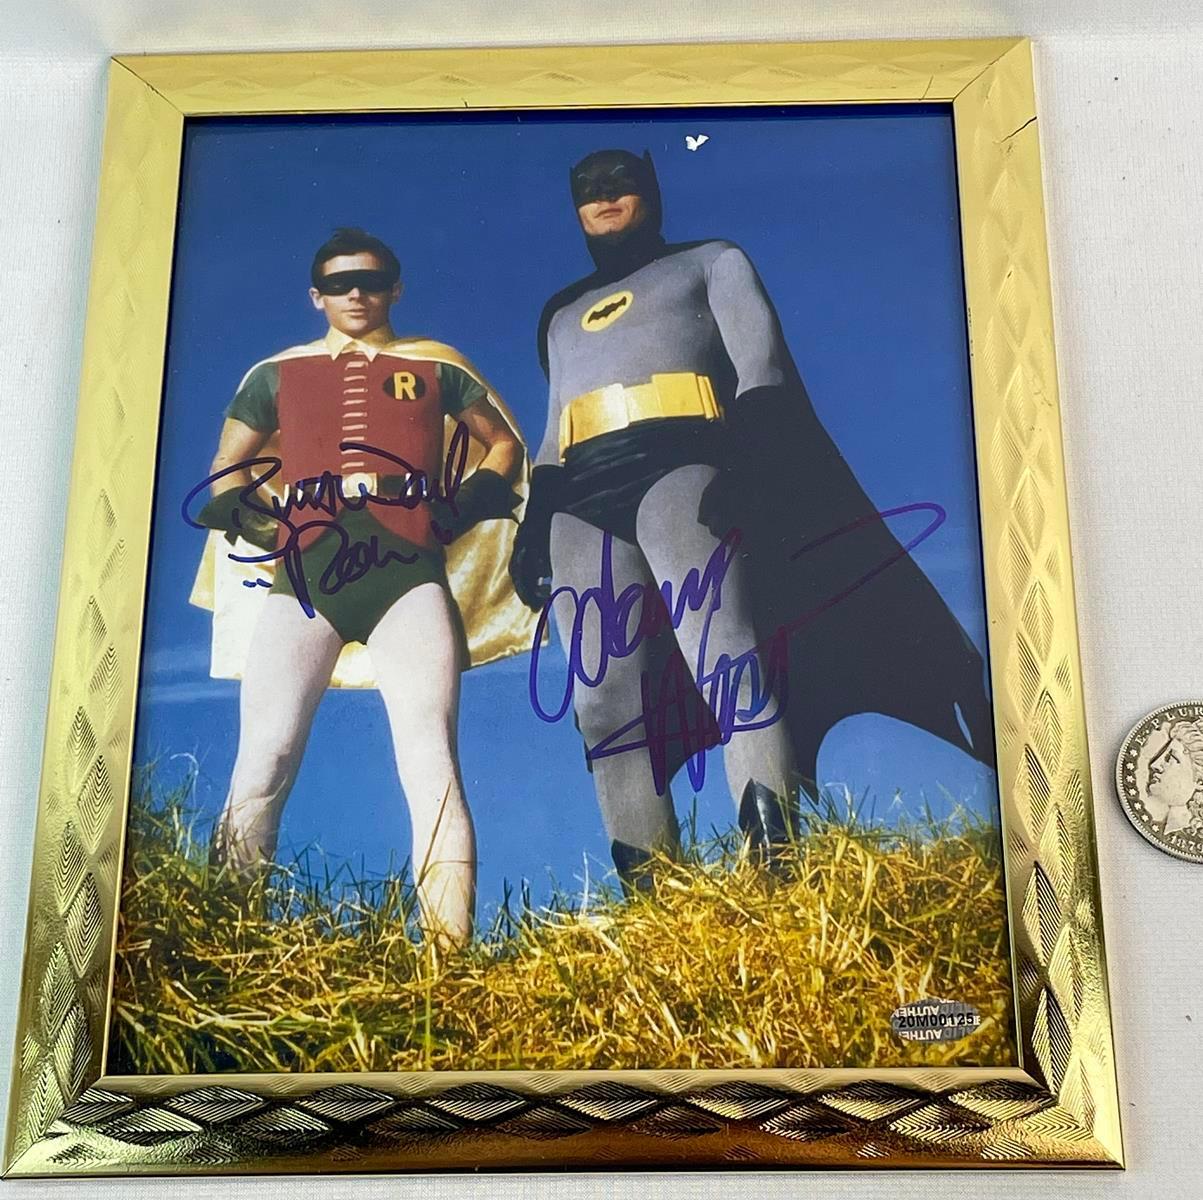 "Autographed Adam West and Burt Ward Batman and Robin Color 8"" x 10"" Framed Photo w/ COA"